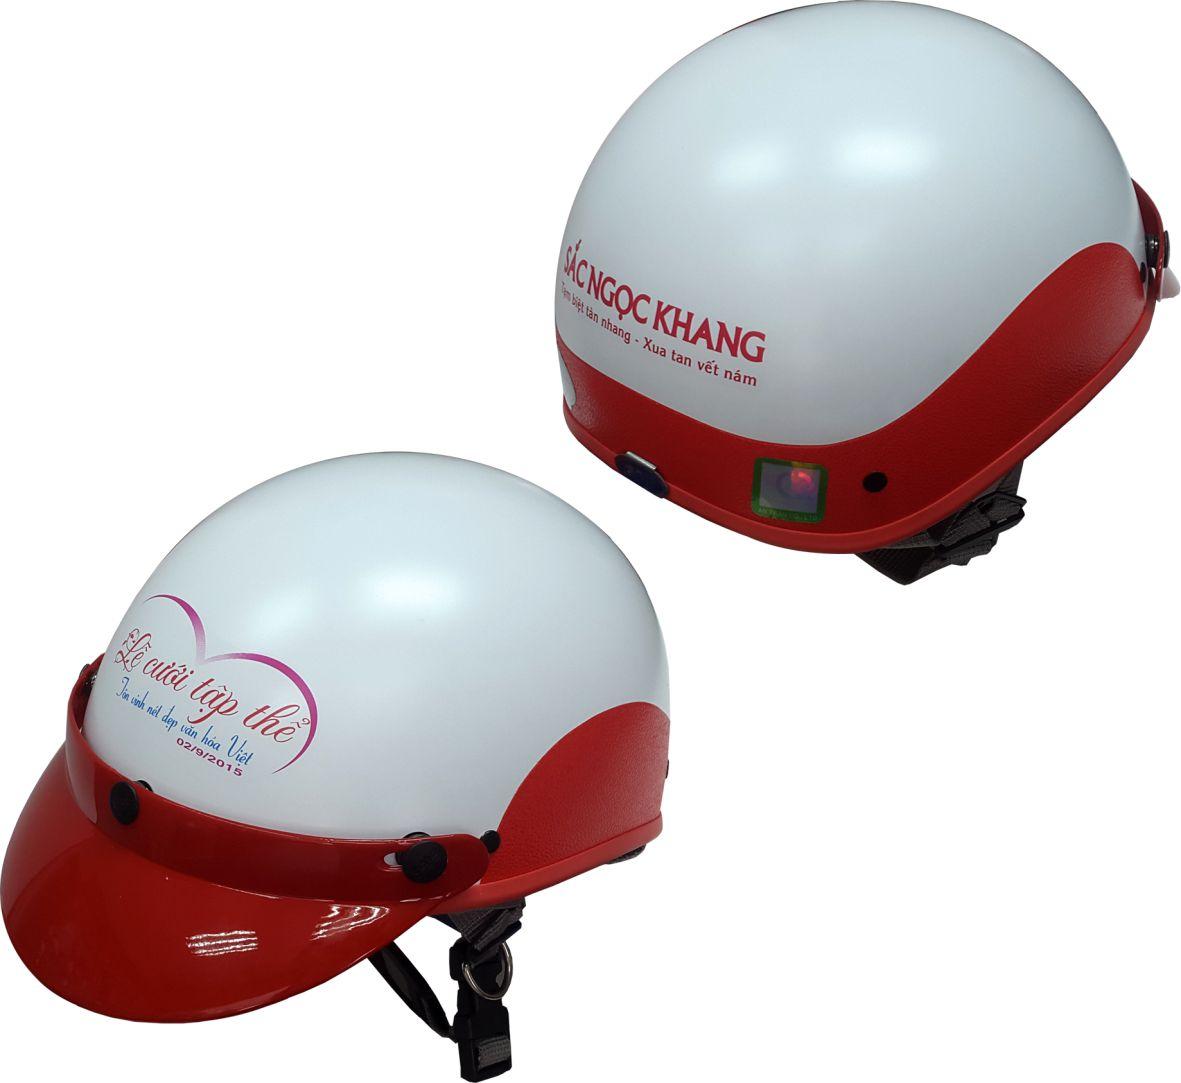 sacngoc khang - Mũ bảo hiểm 10